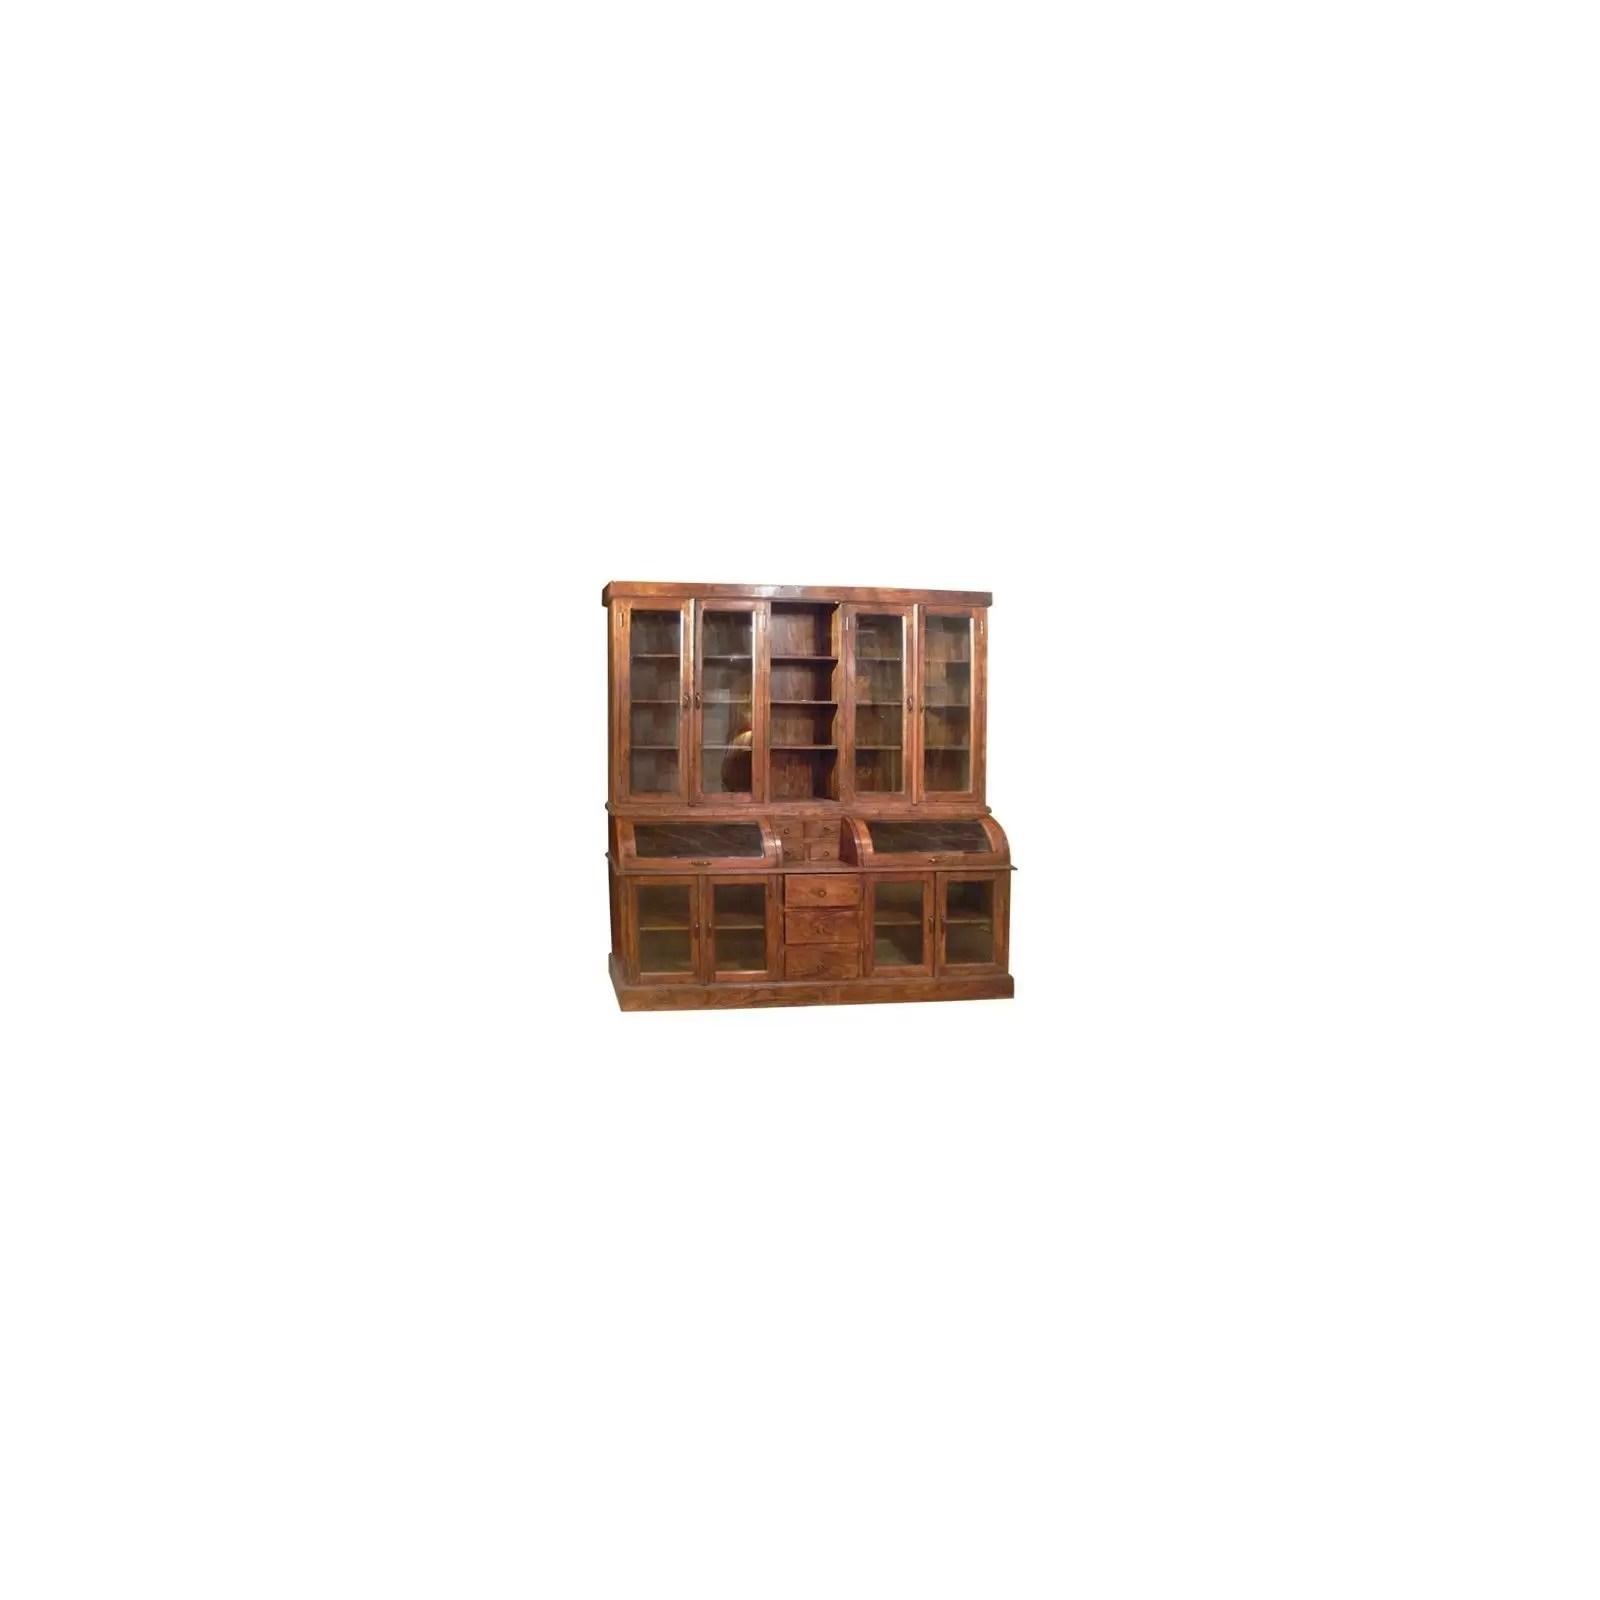 bibliotheque vitrine cara petit modele 2 corps en bois d acacia massif ethnique chic